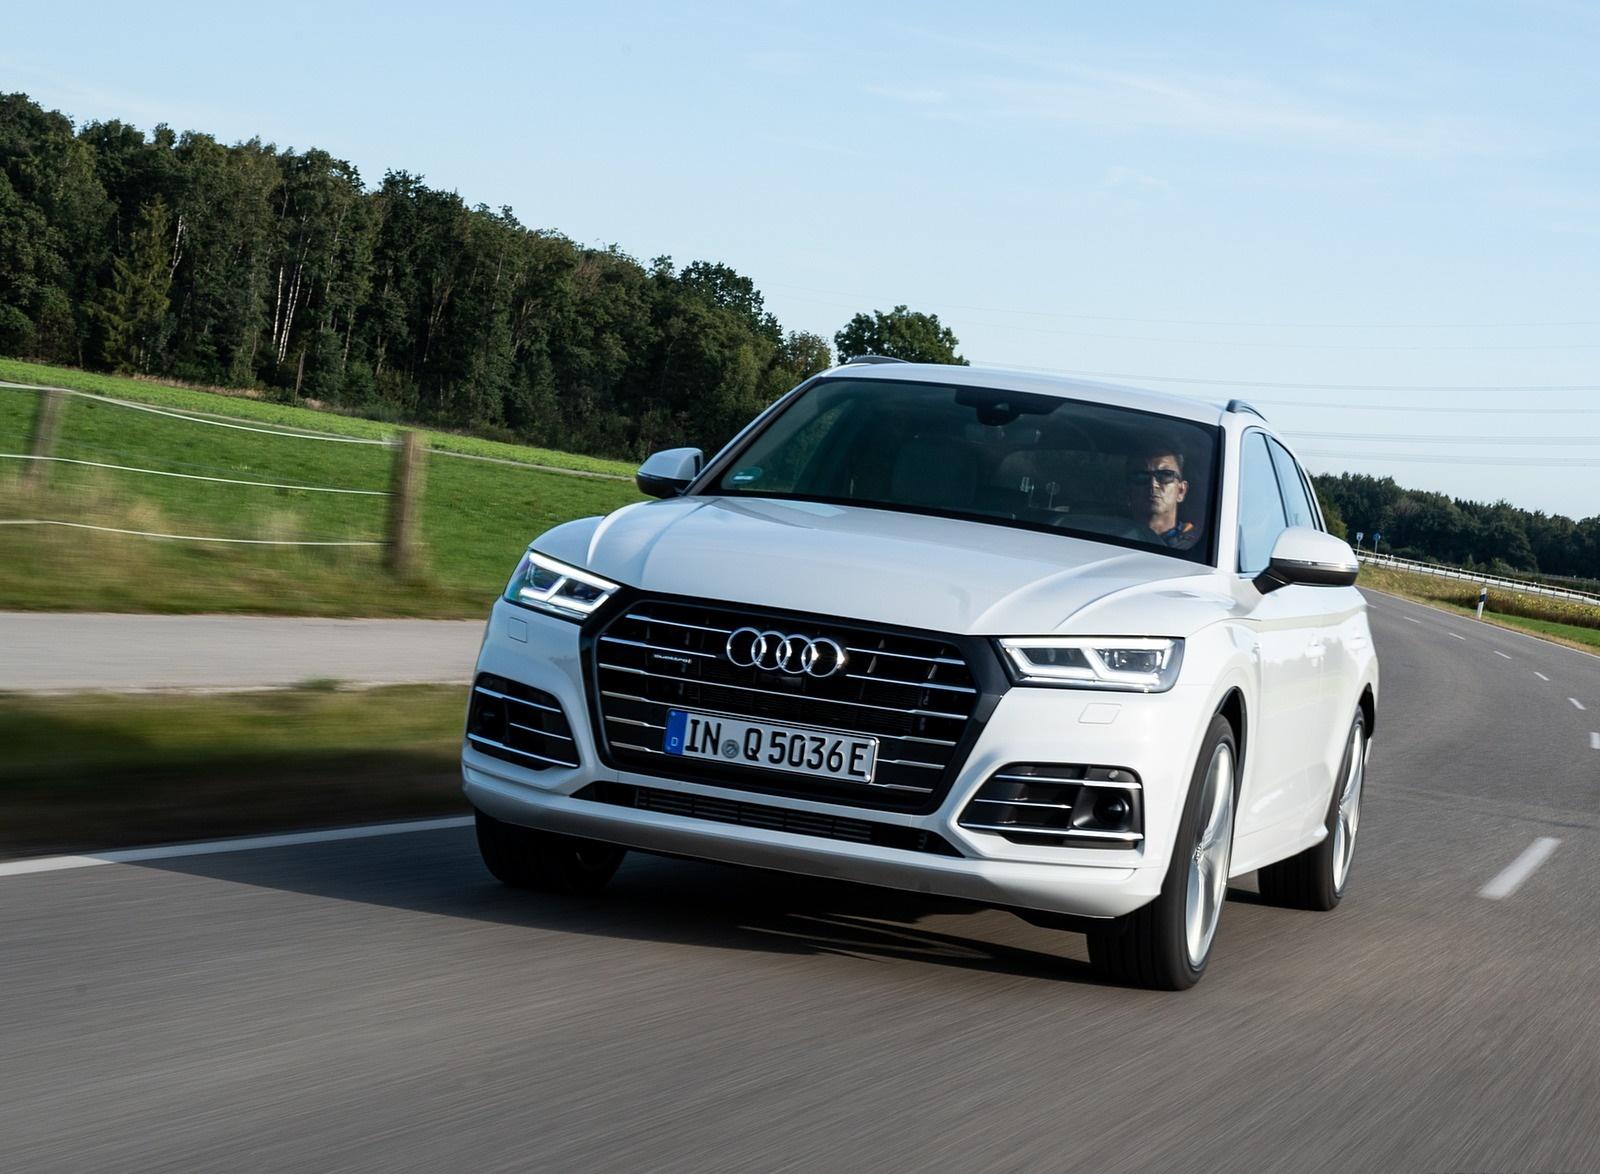 2020 Audi Q5 TFSI e Plug-In Hybrid (Color: Glacier White) Front Three-Quarter Wallpapers #1 of 154